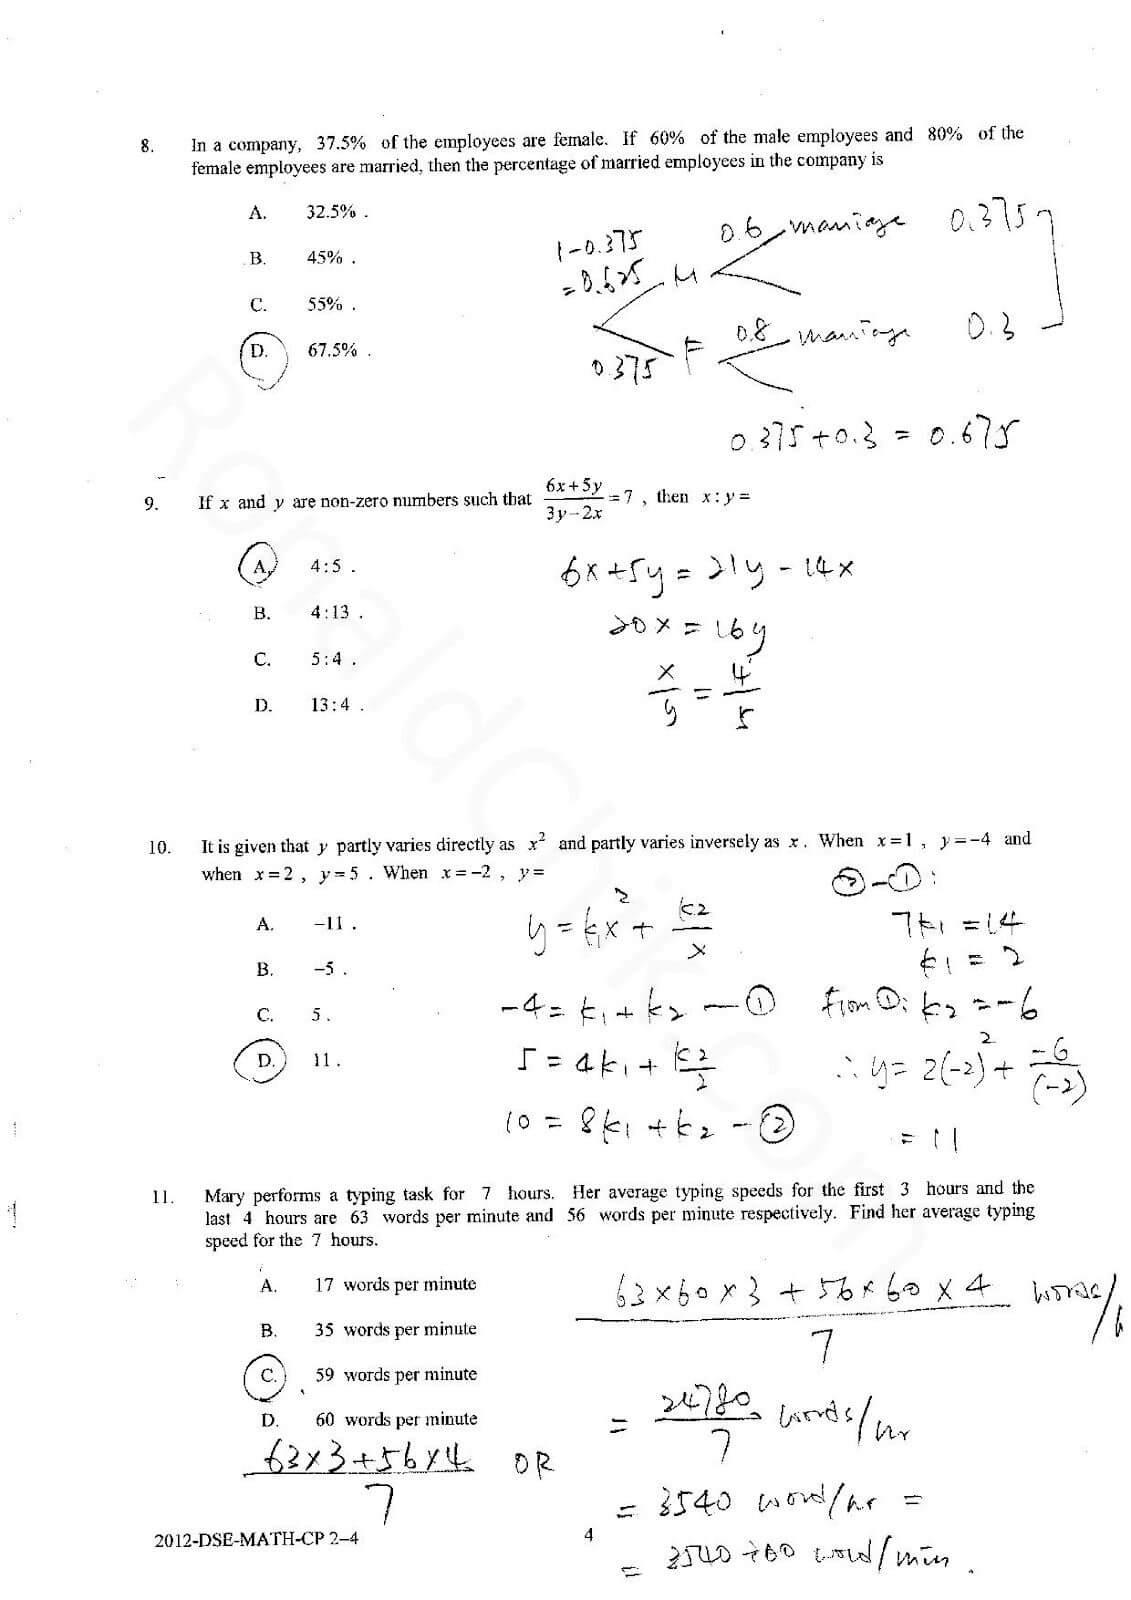 2012 DSE Math P2 卷二 Q8,9,10,11